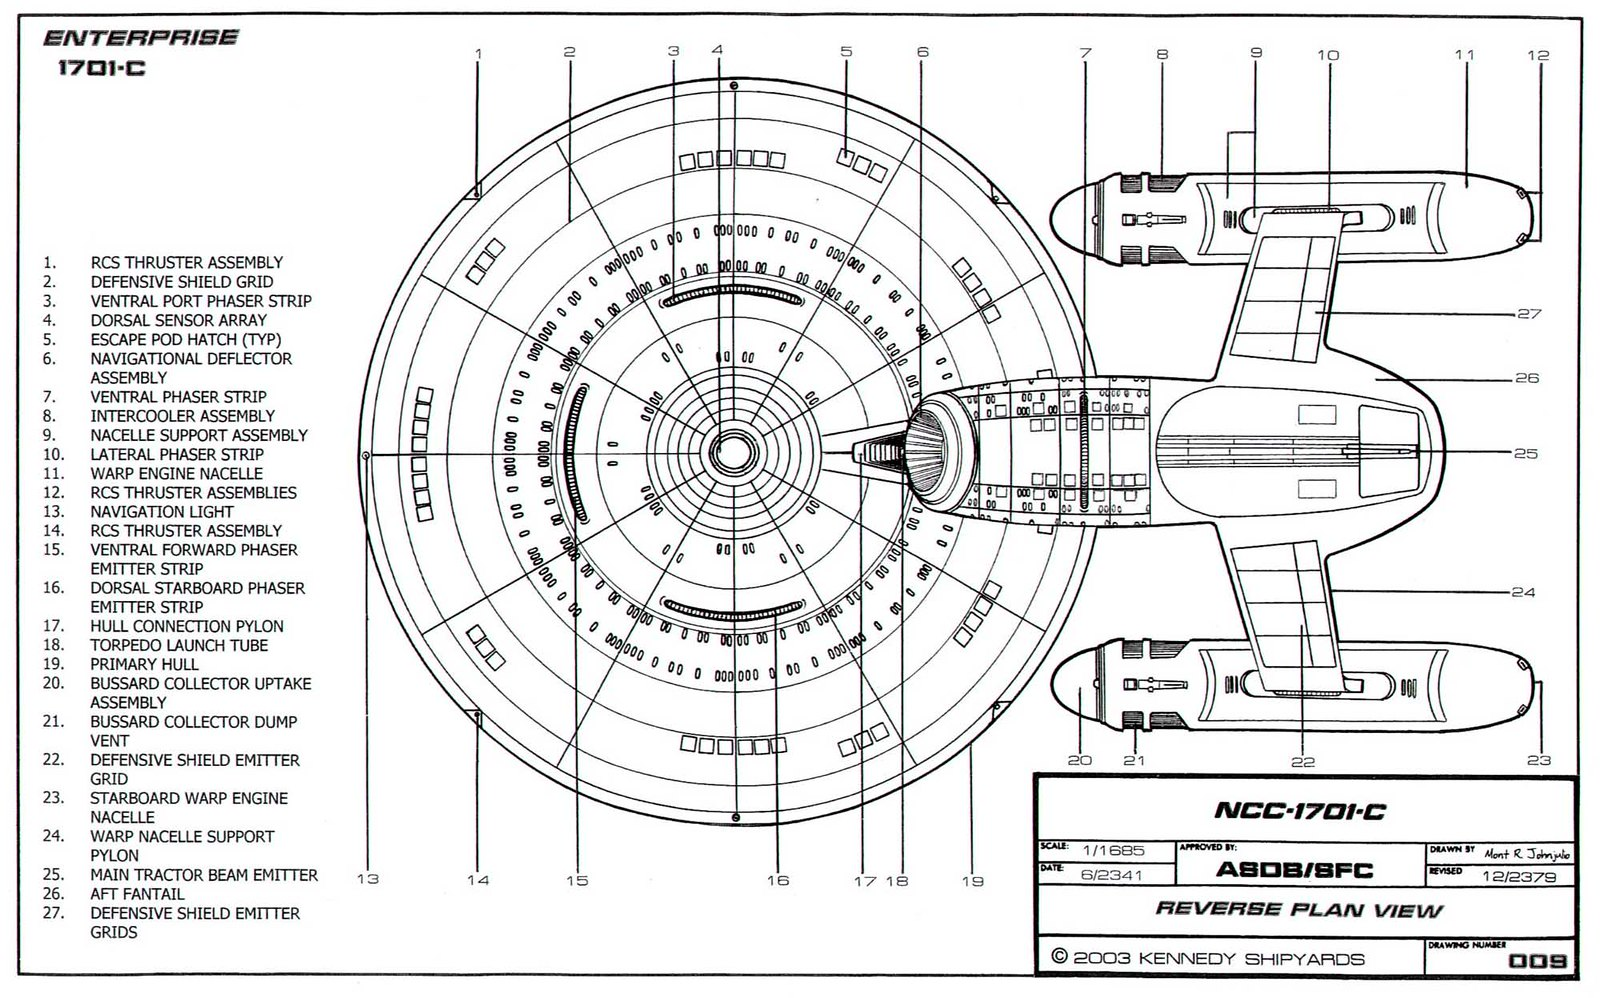 The Amazo Effect Ships Of The Line Ii The Blueprints Of